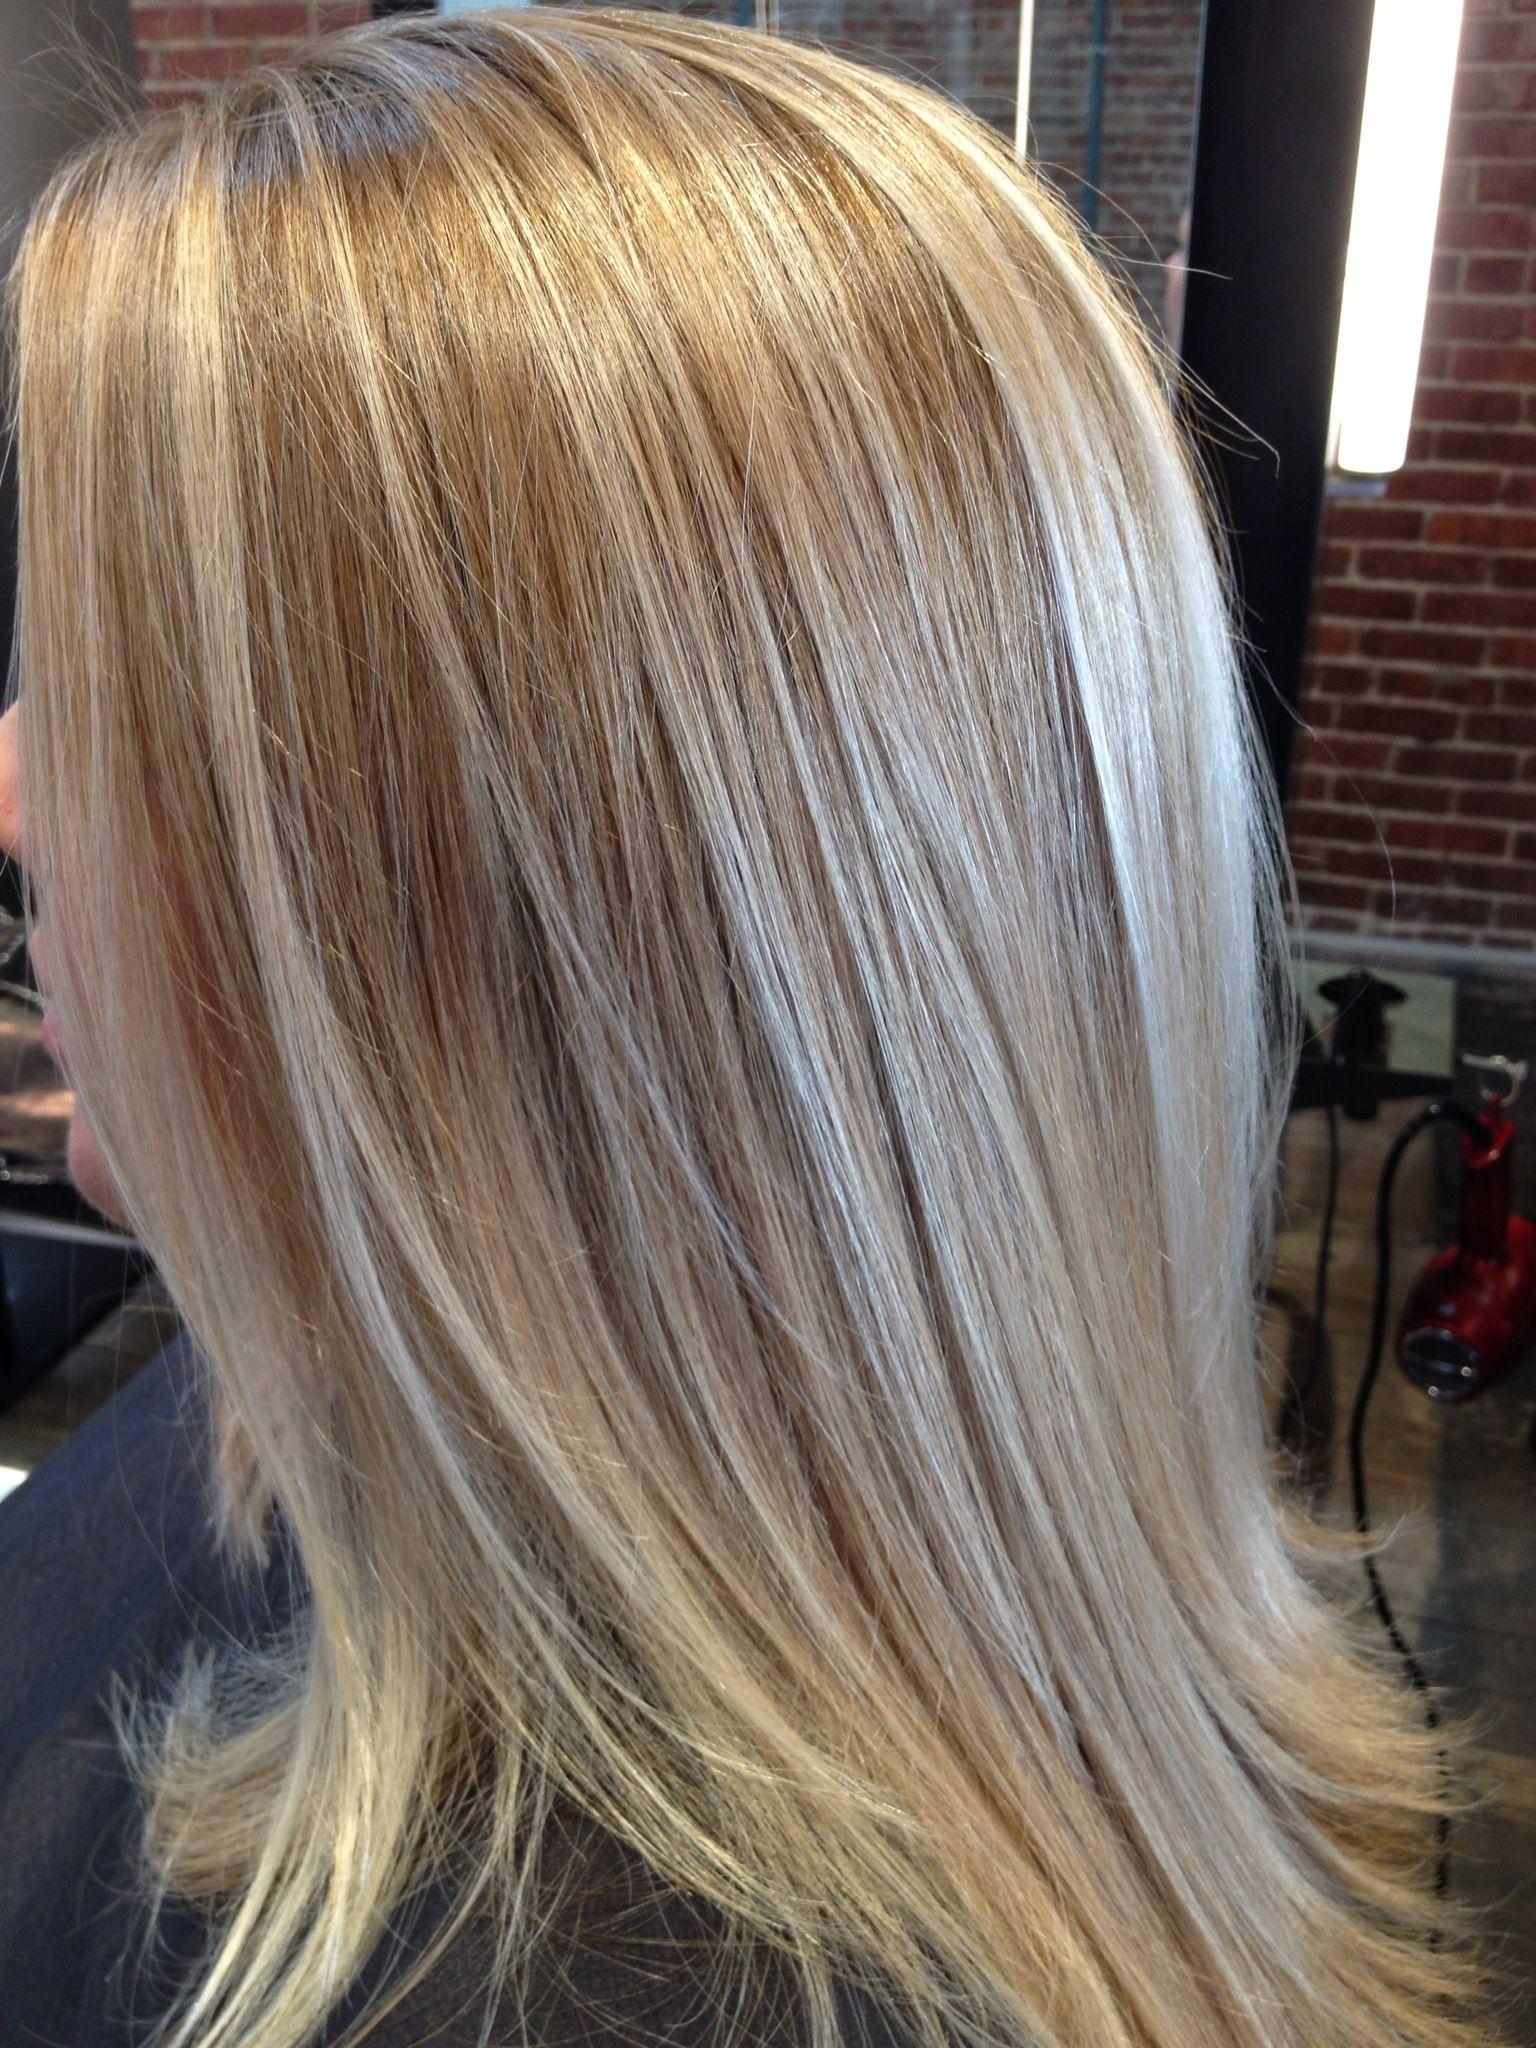 Dimensional Blonde Glazed With Wella Illumina 10 36